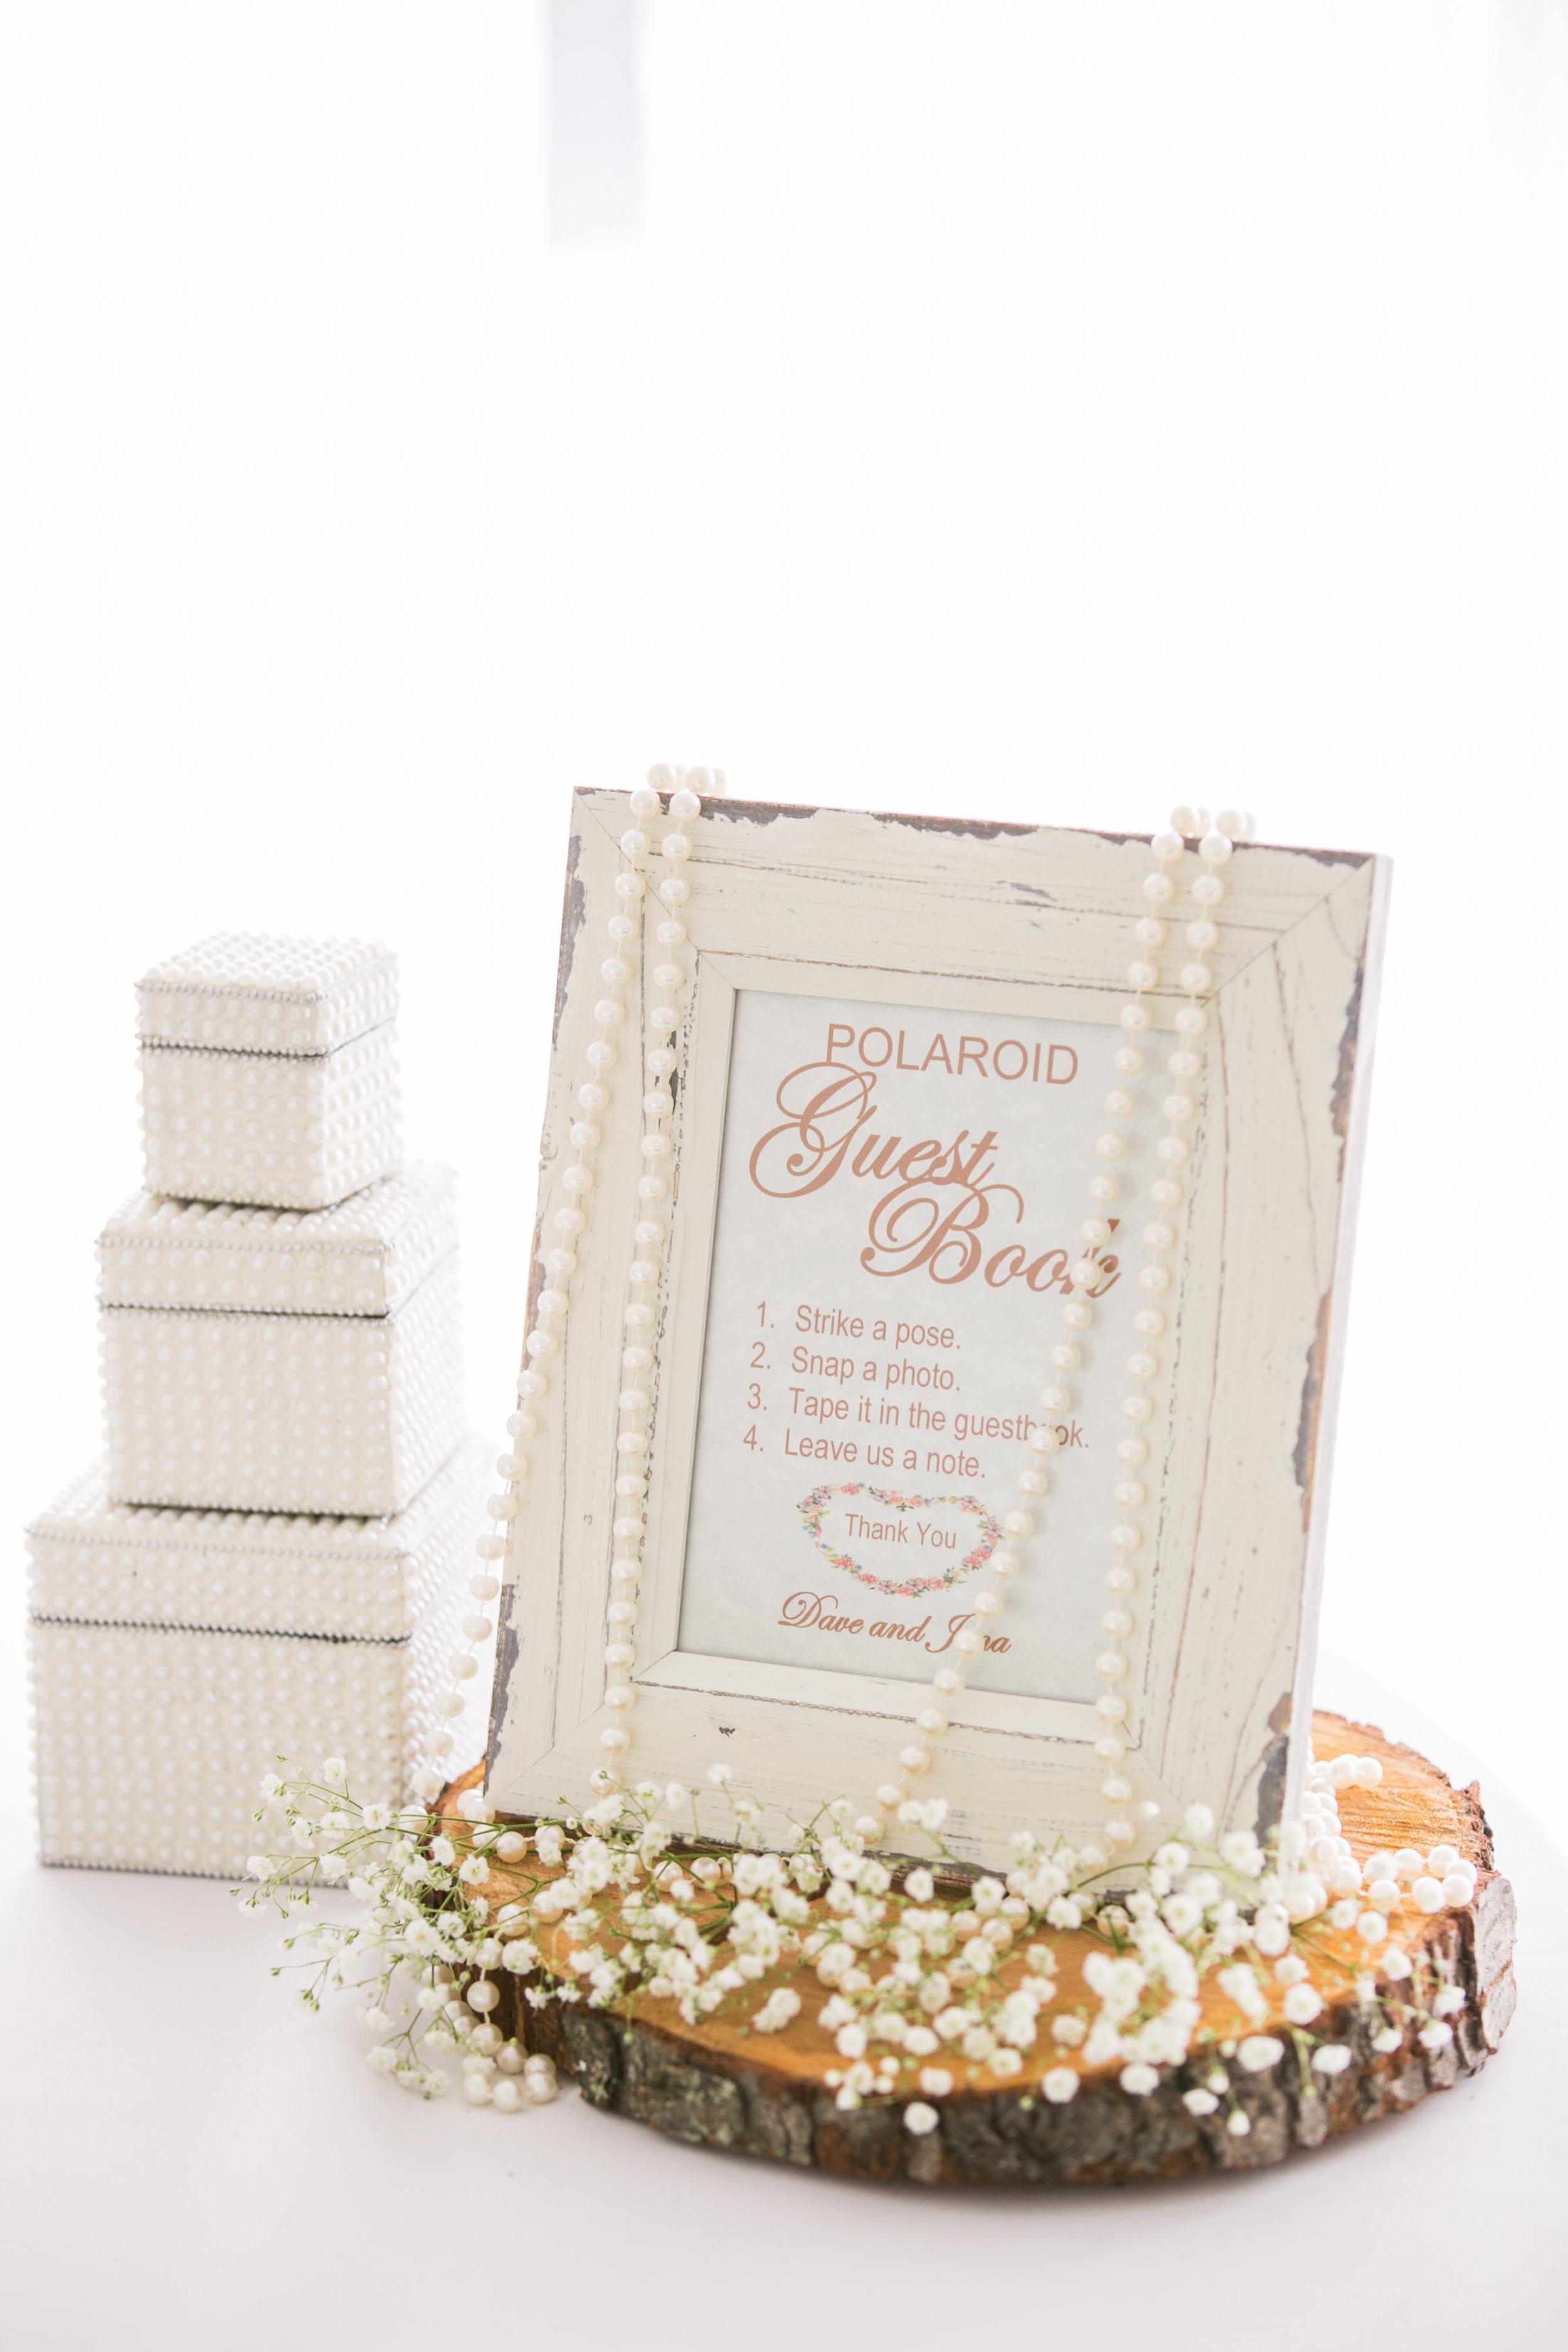 Pure elegance events Tynise Kee dc wedding planner va wedding planner rust manor house leesburg -0035.jpg